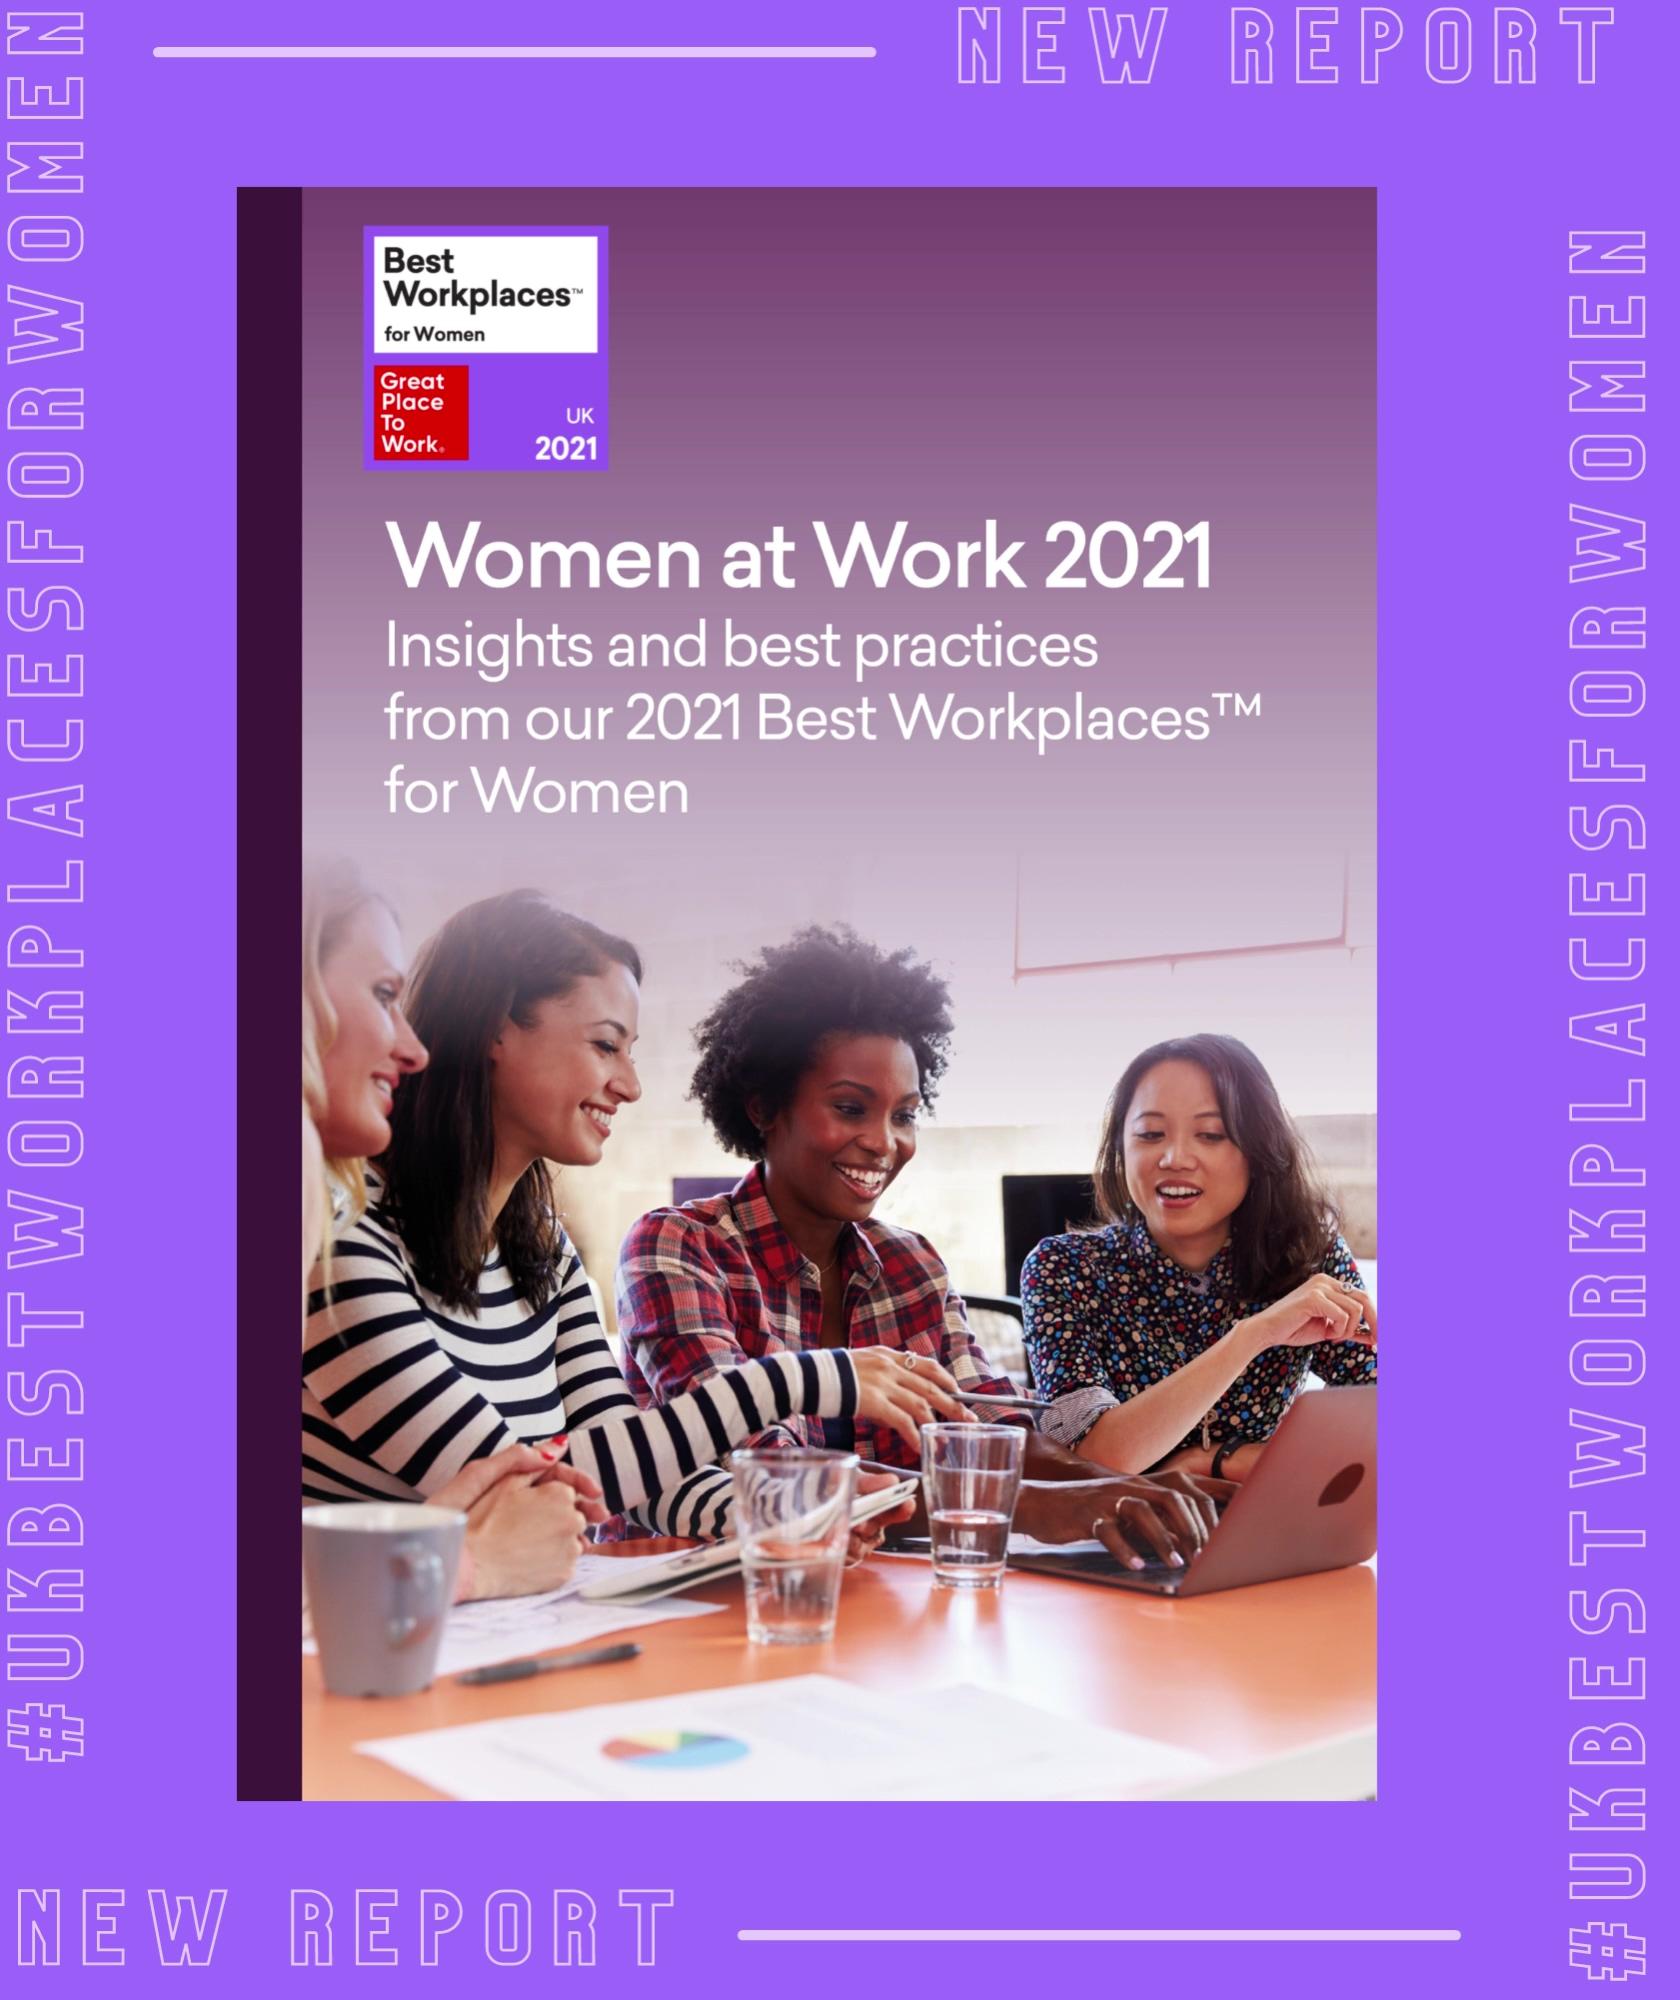 2021-women-at-work-video-Publication-Promo